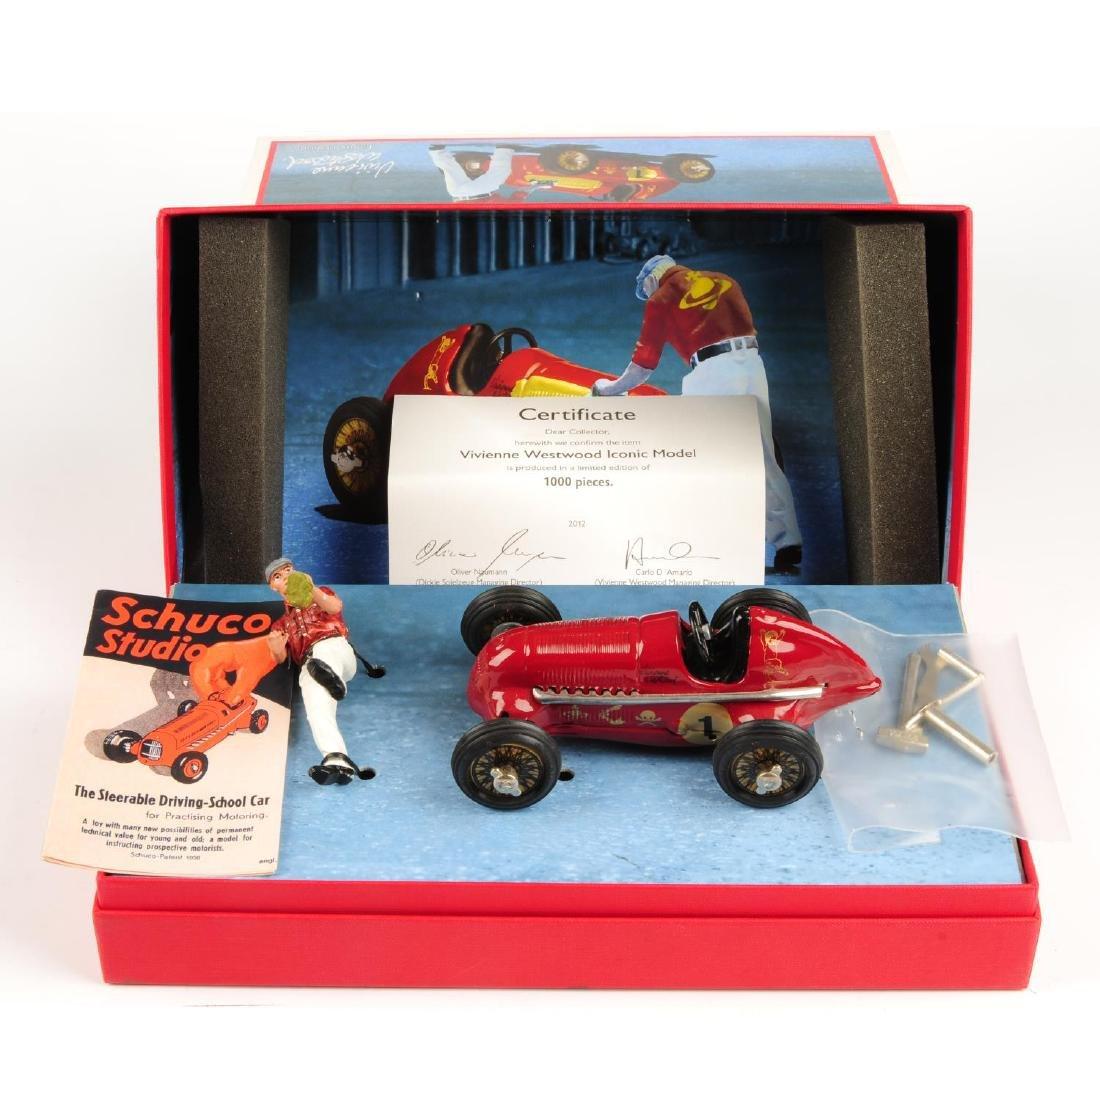 VIVIENNE WESTWOOD - a limited edition Schuco 1936 - 2